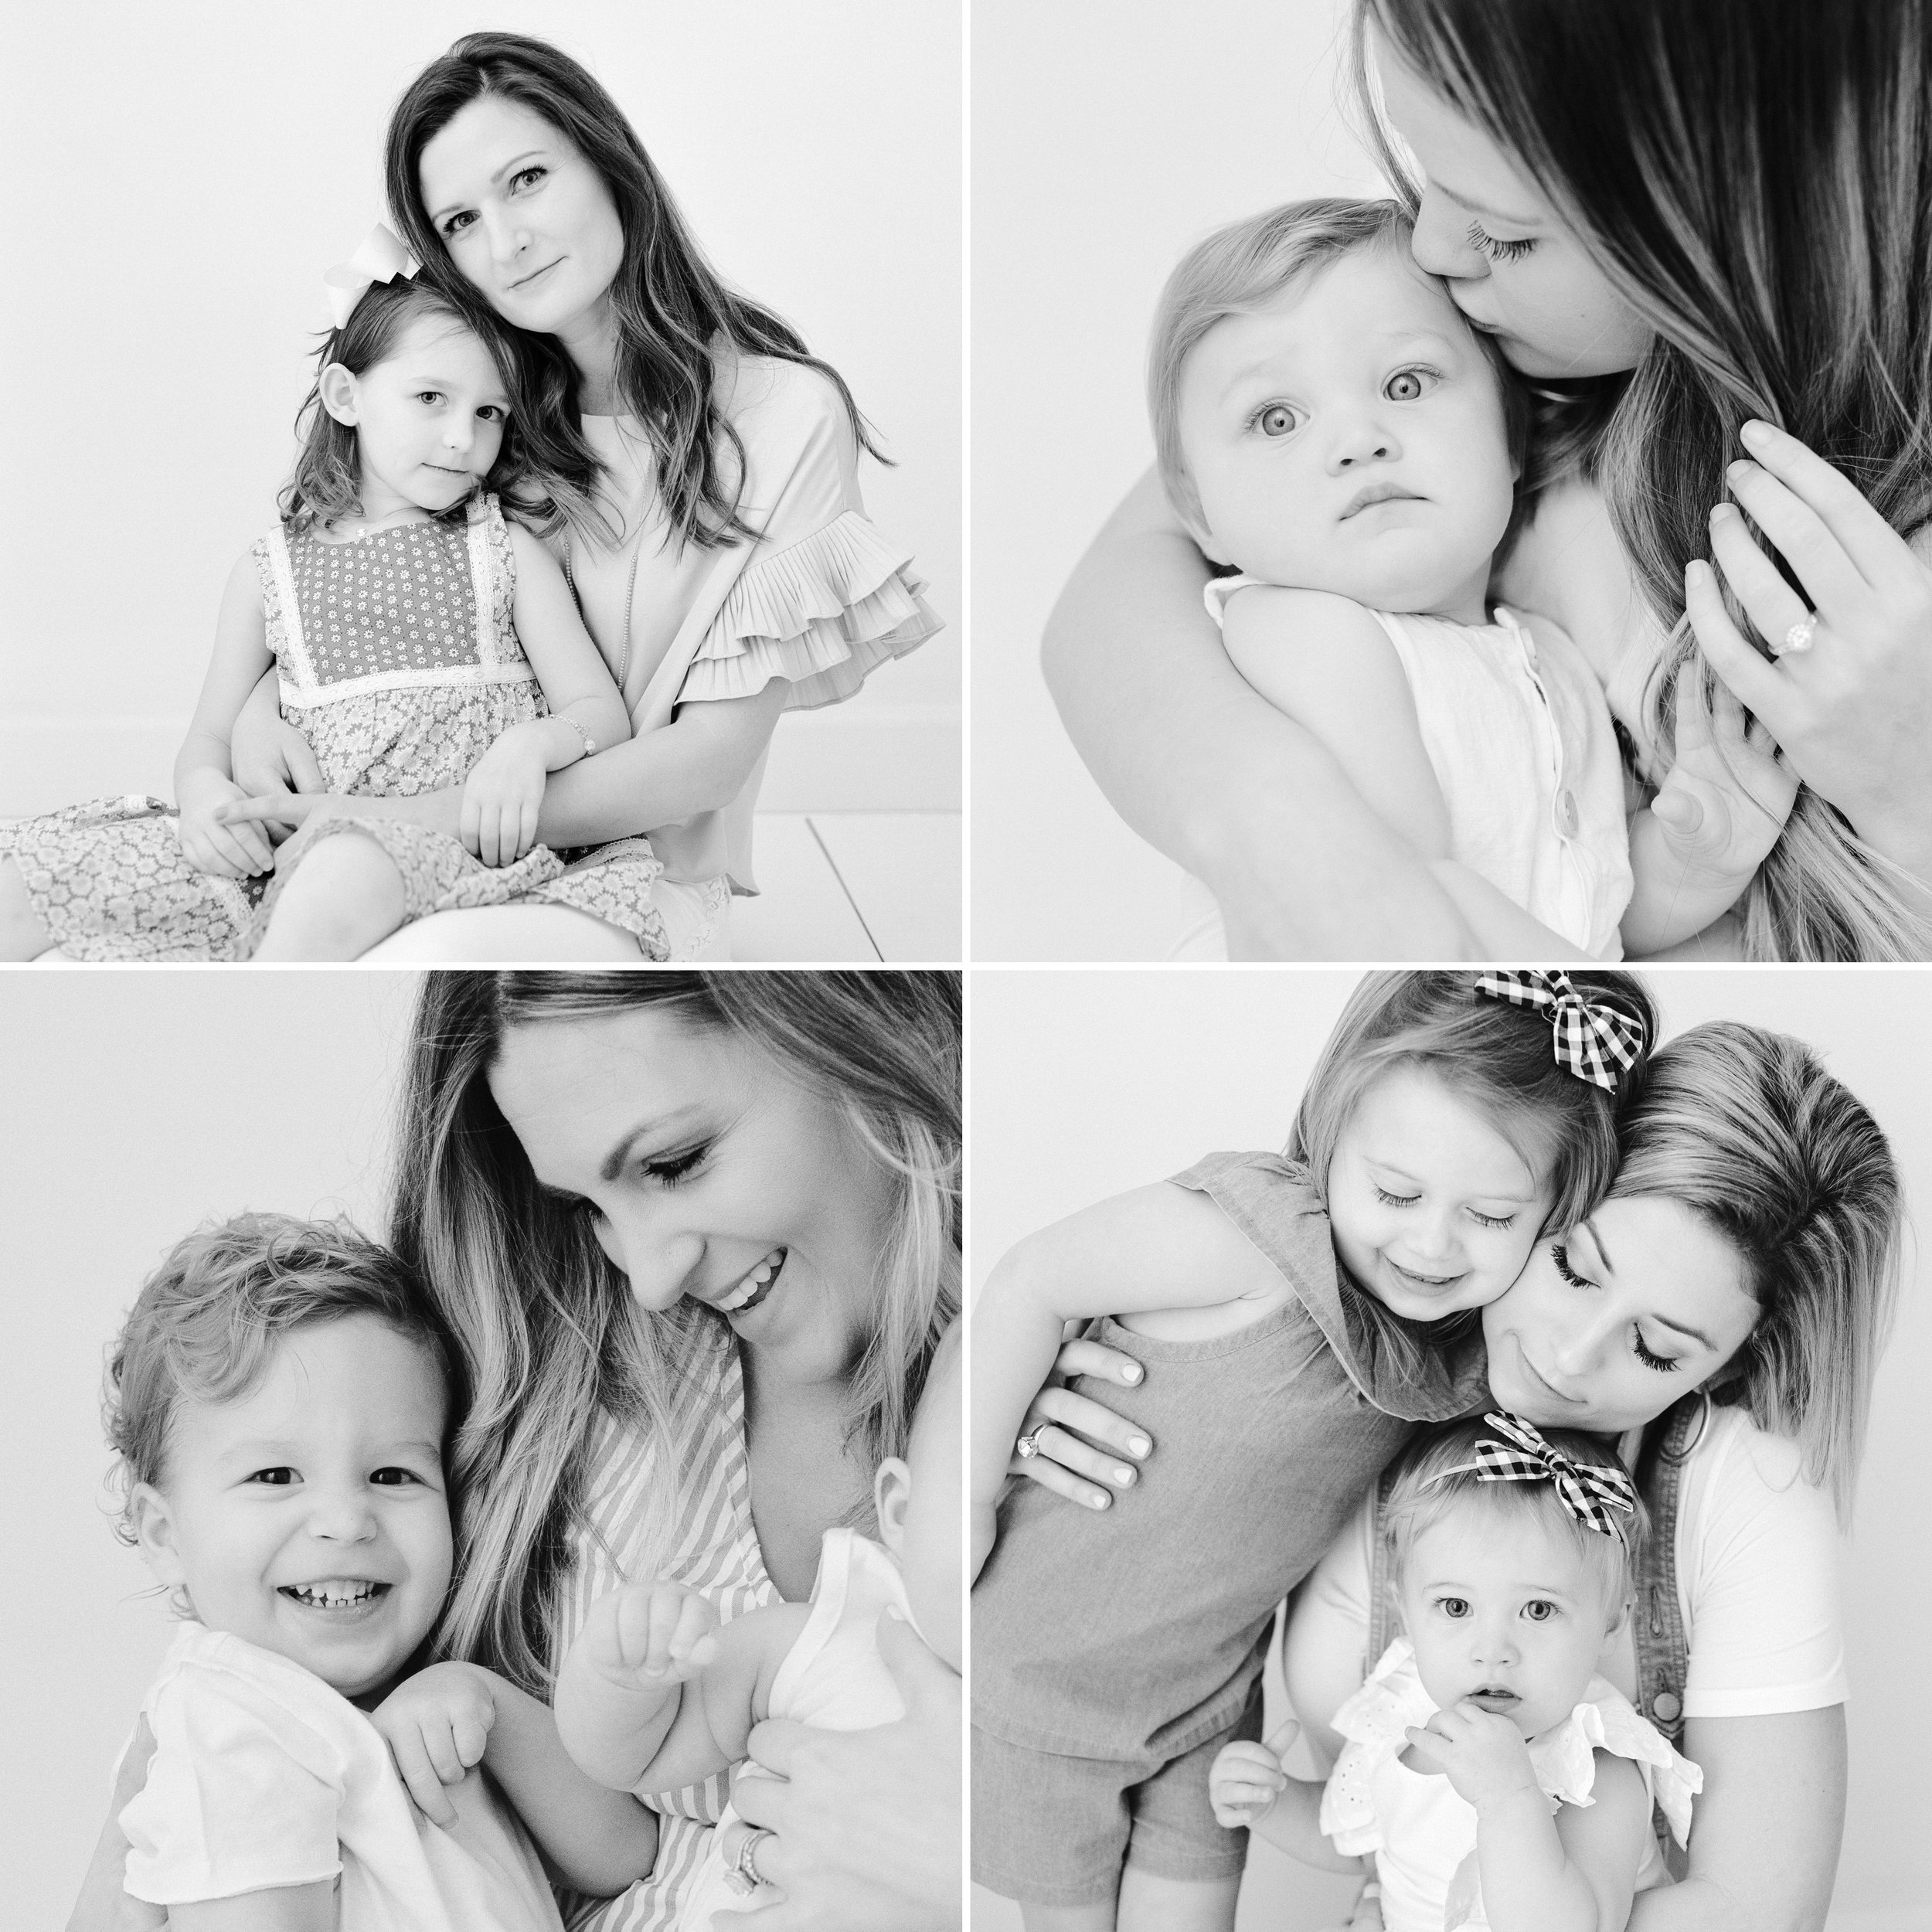 raleigh-newborn-family-film-photographer-portraits-milestone-baby-motherhood-studio-photography-1